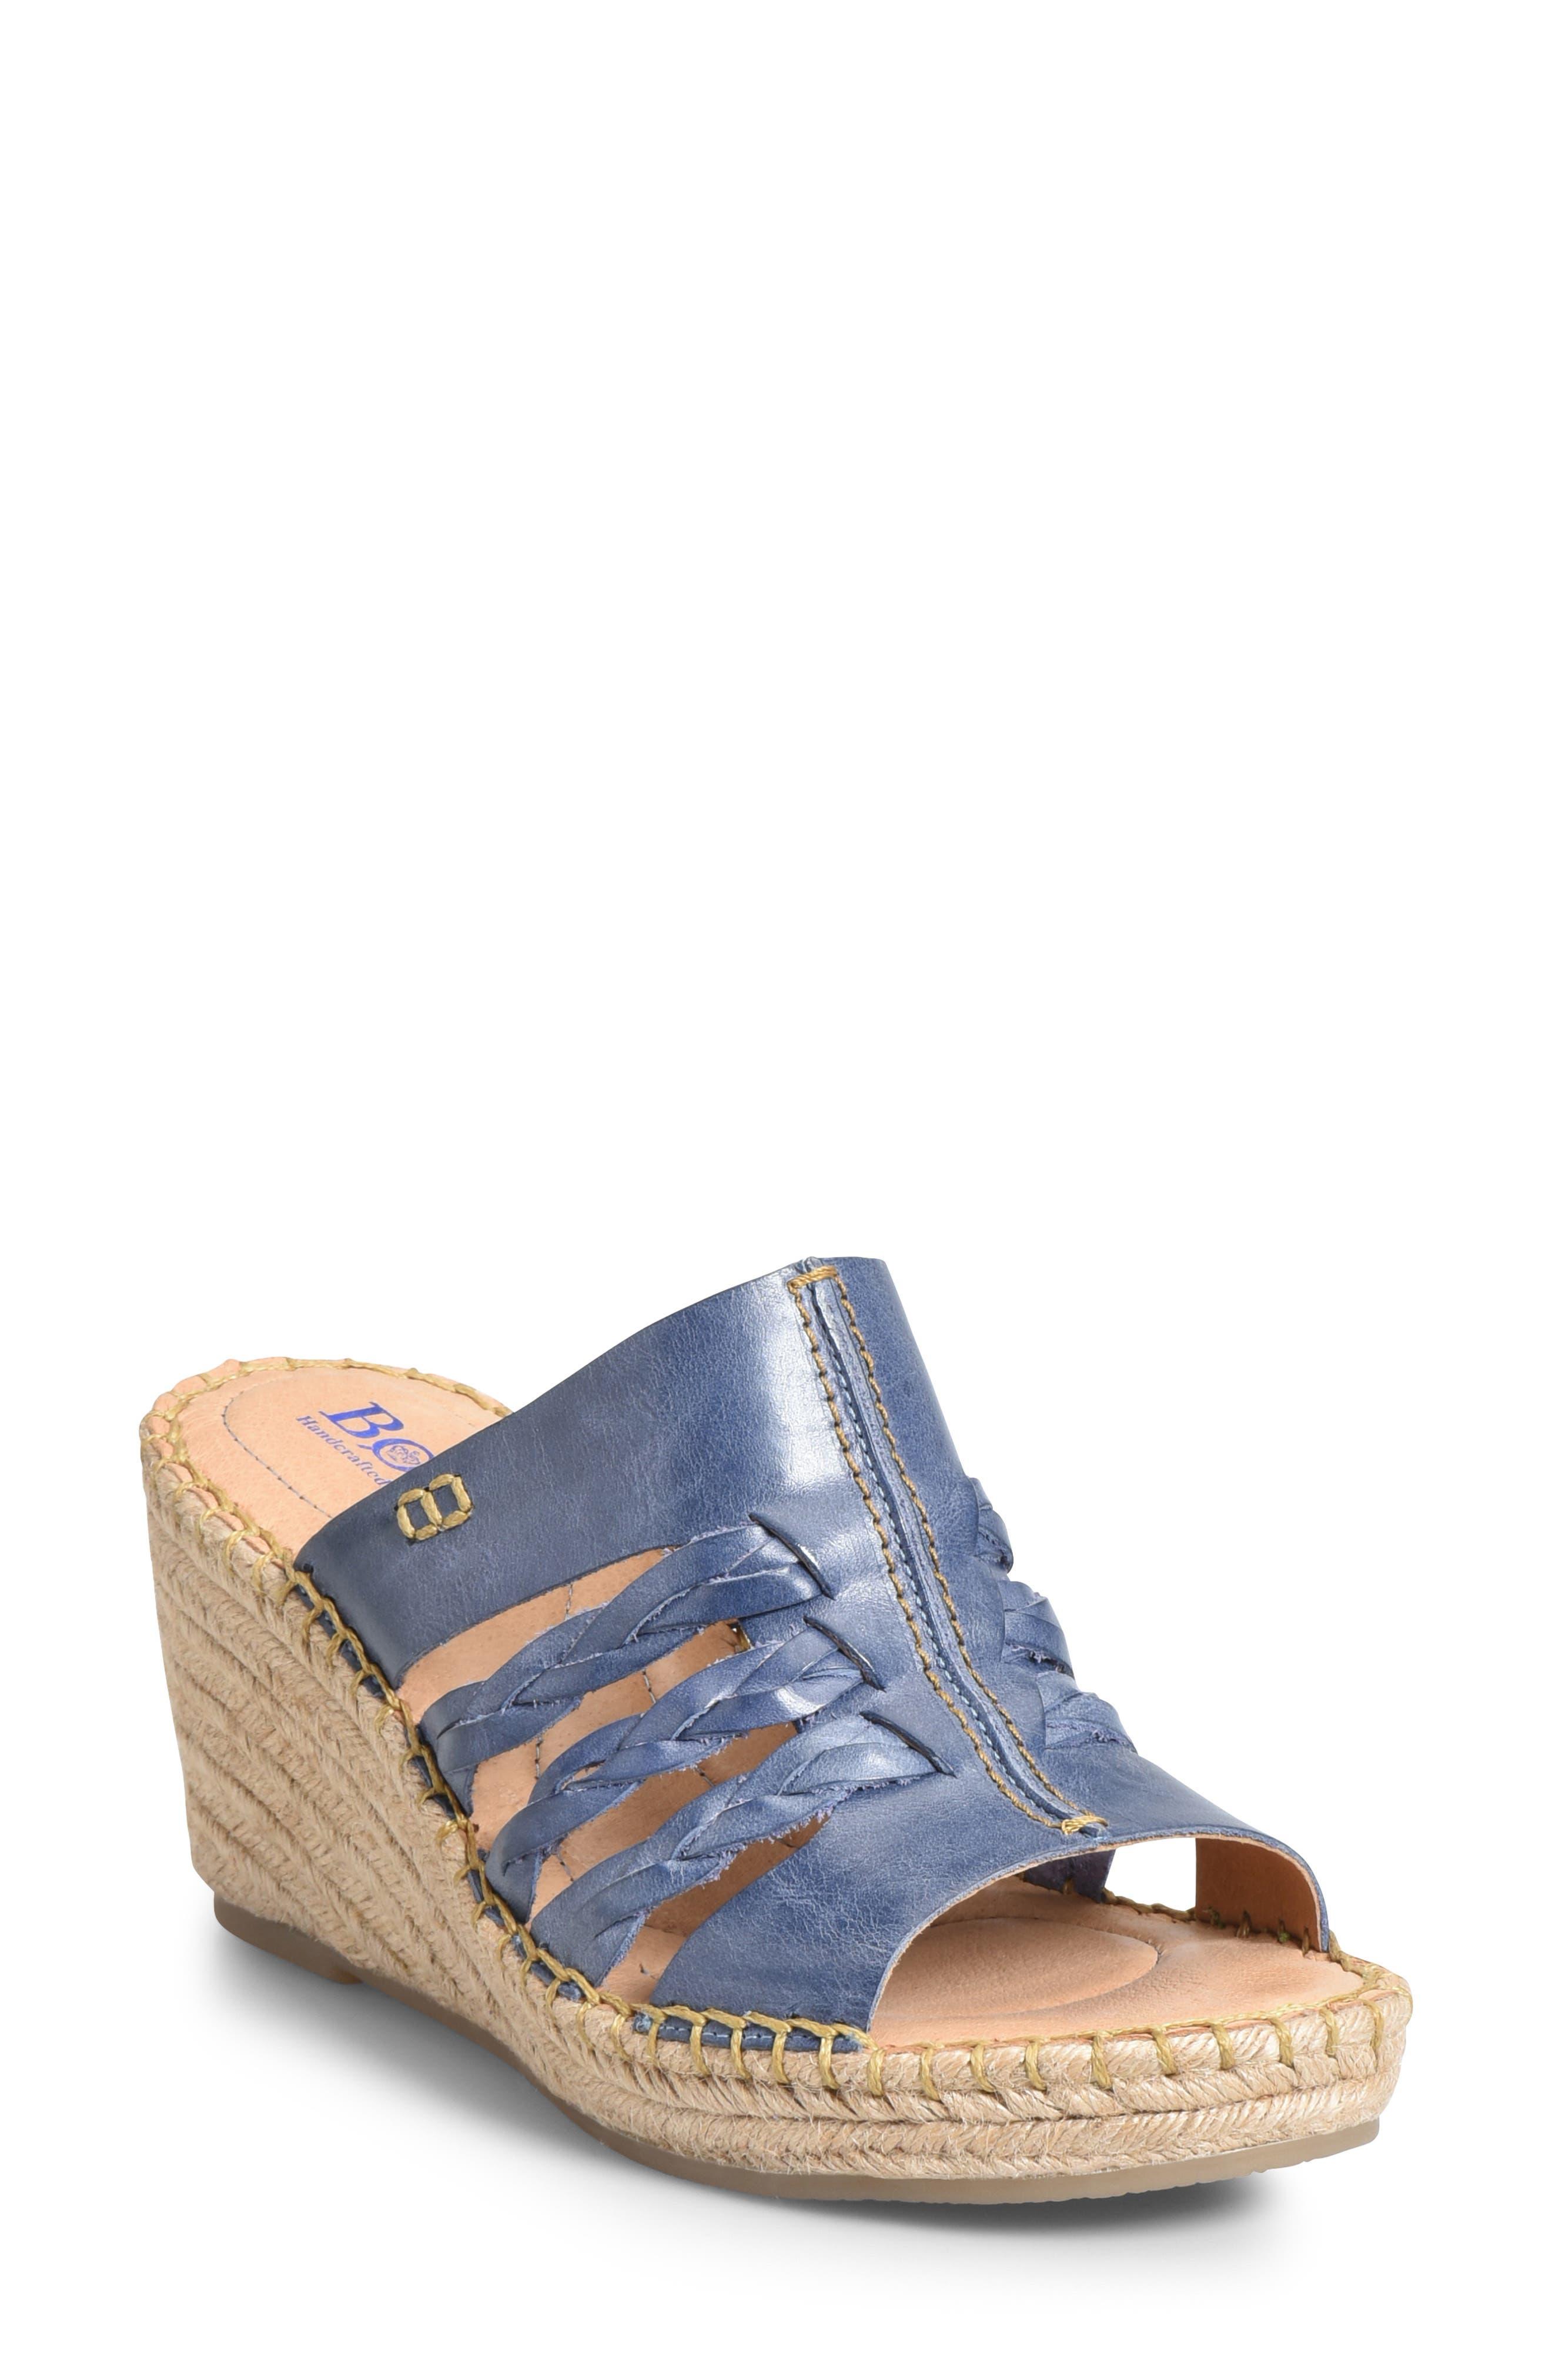 B?rn Pinal Wedge Slide Sandal